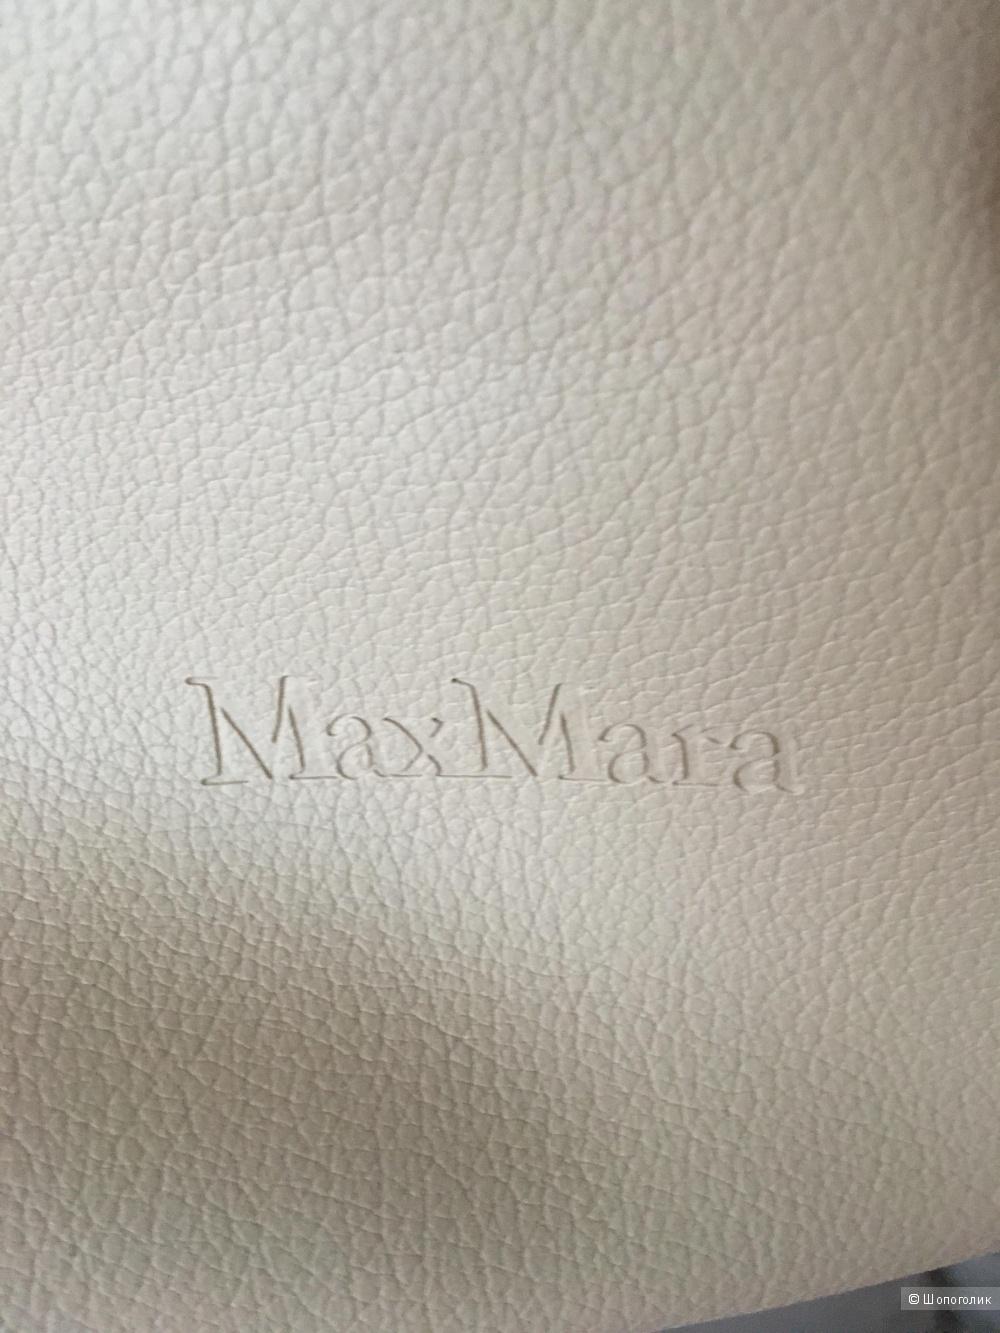 Сумка MaxMara, кож. Зам.